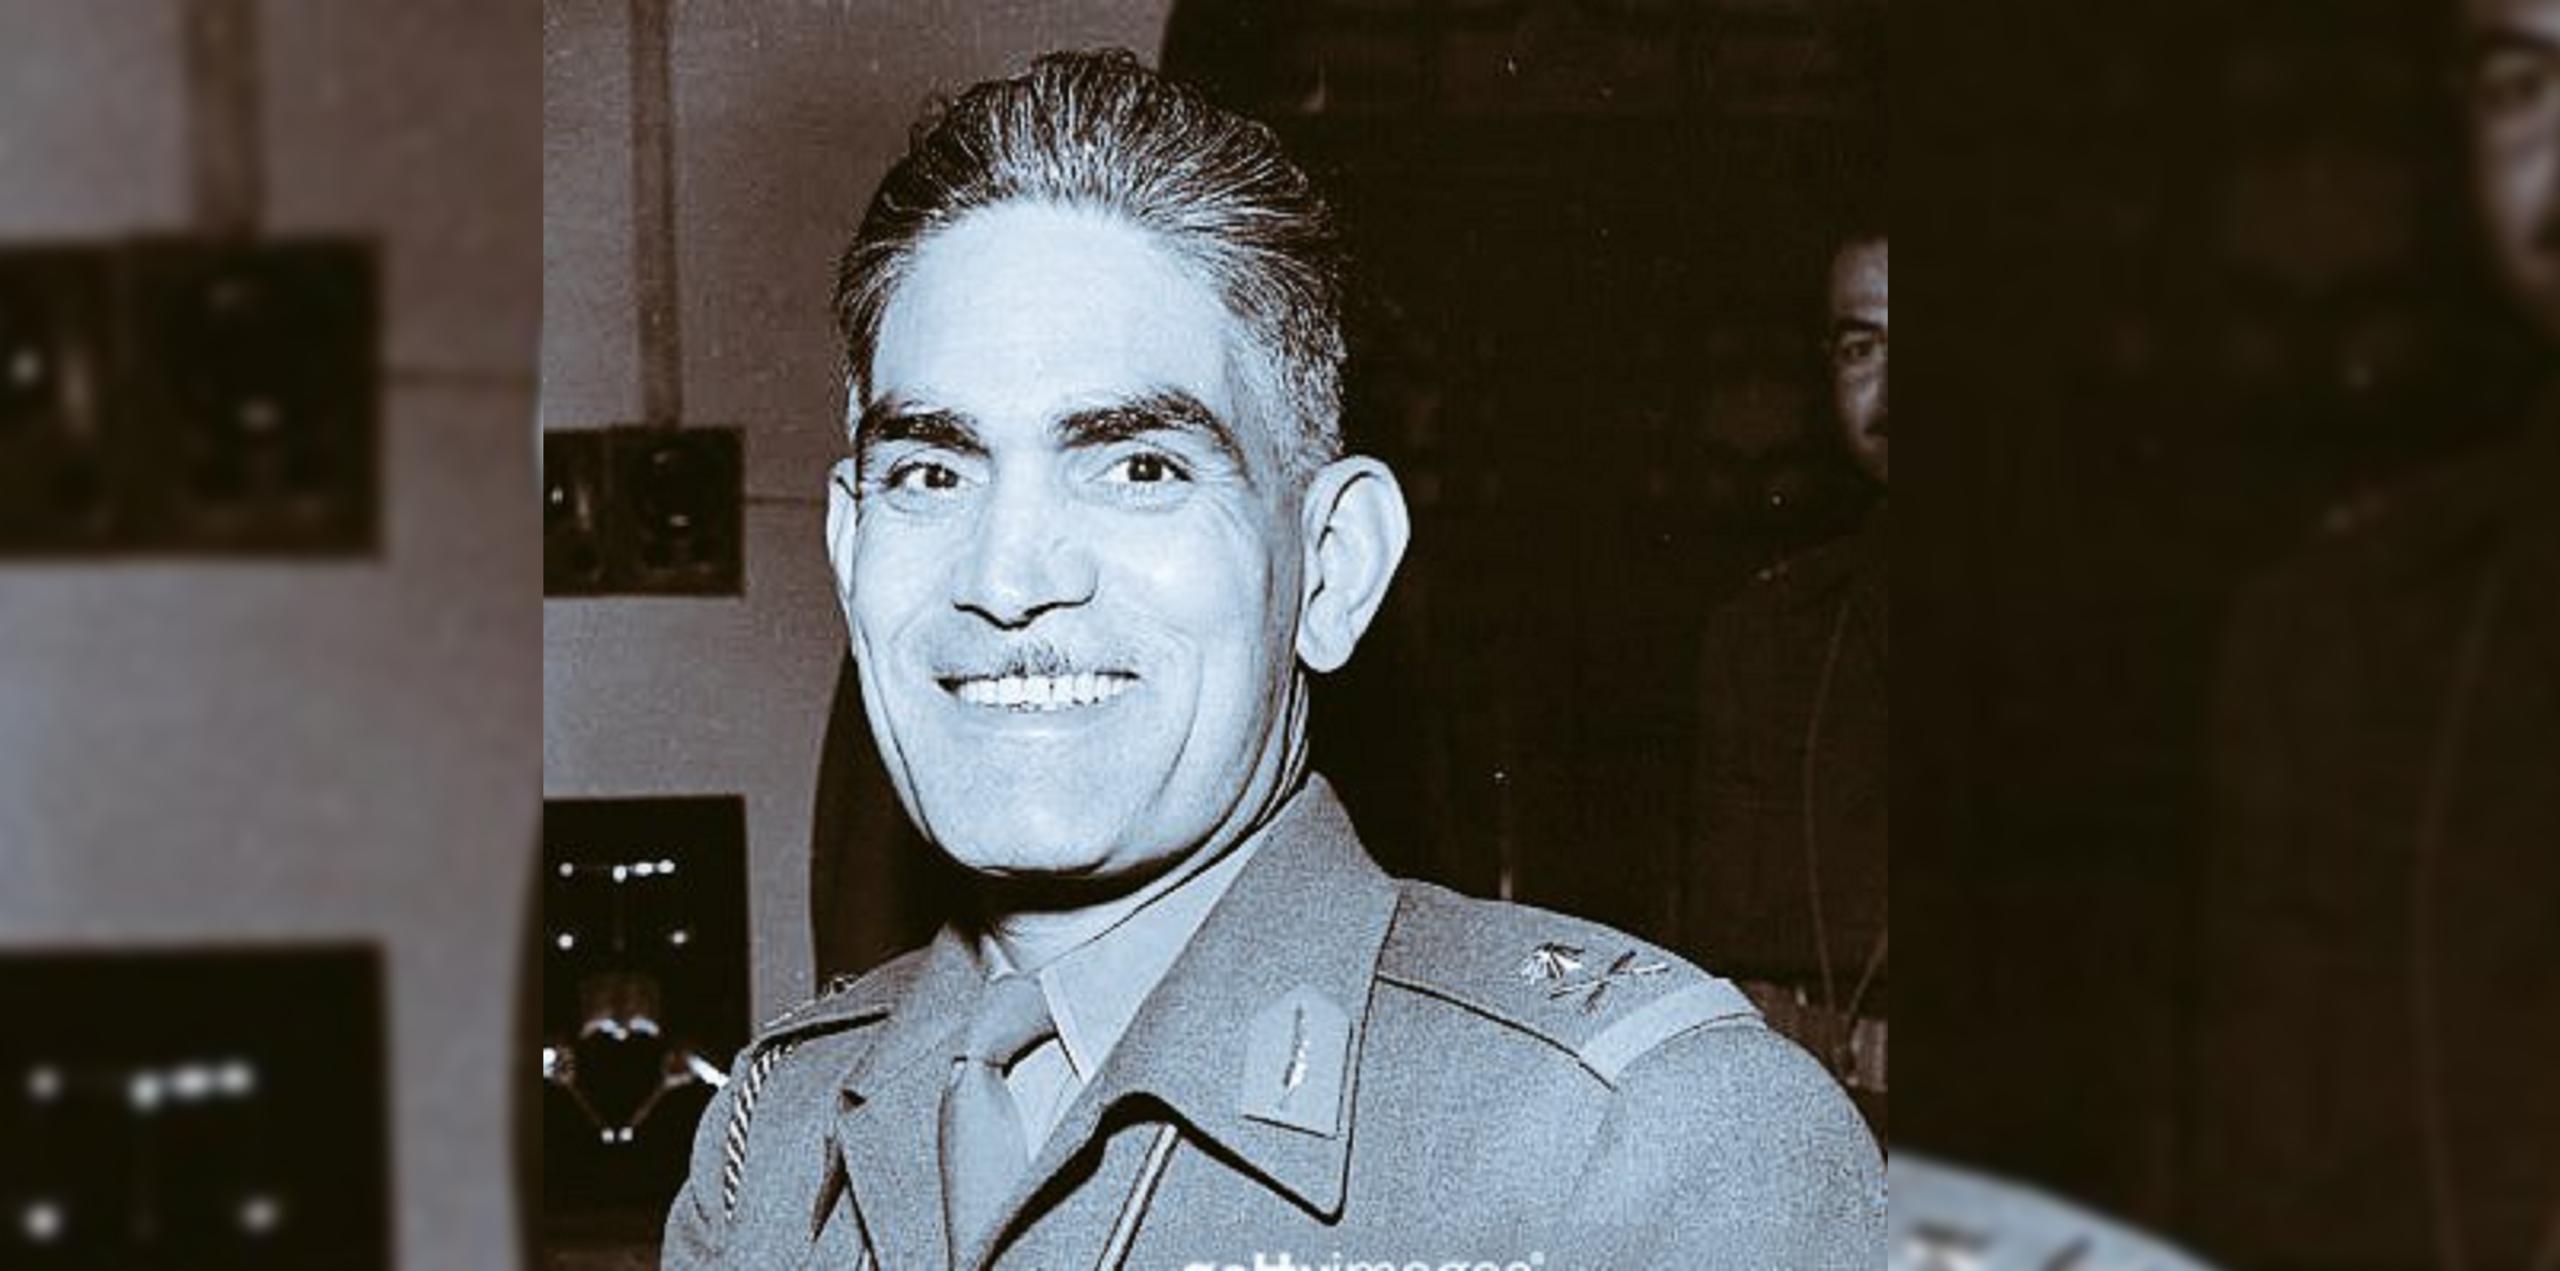 Col. Abd al-Karim Qasim, who launched the 1958 coup. (Twitter, @mometov)